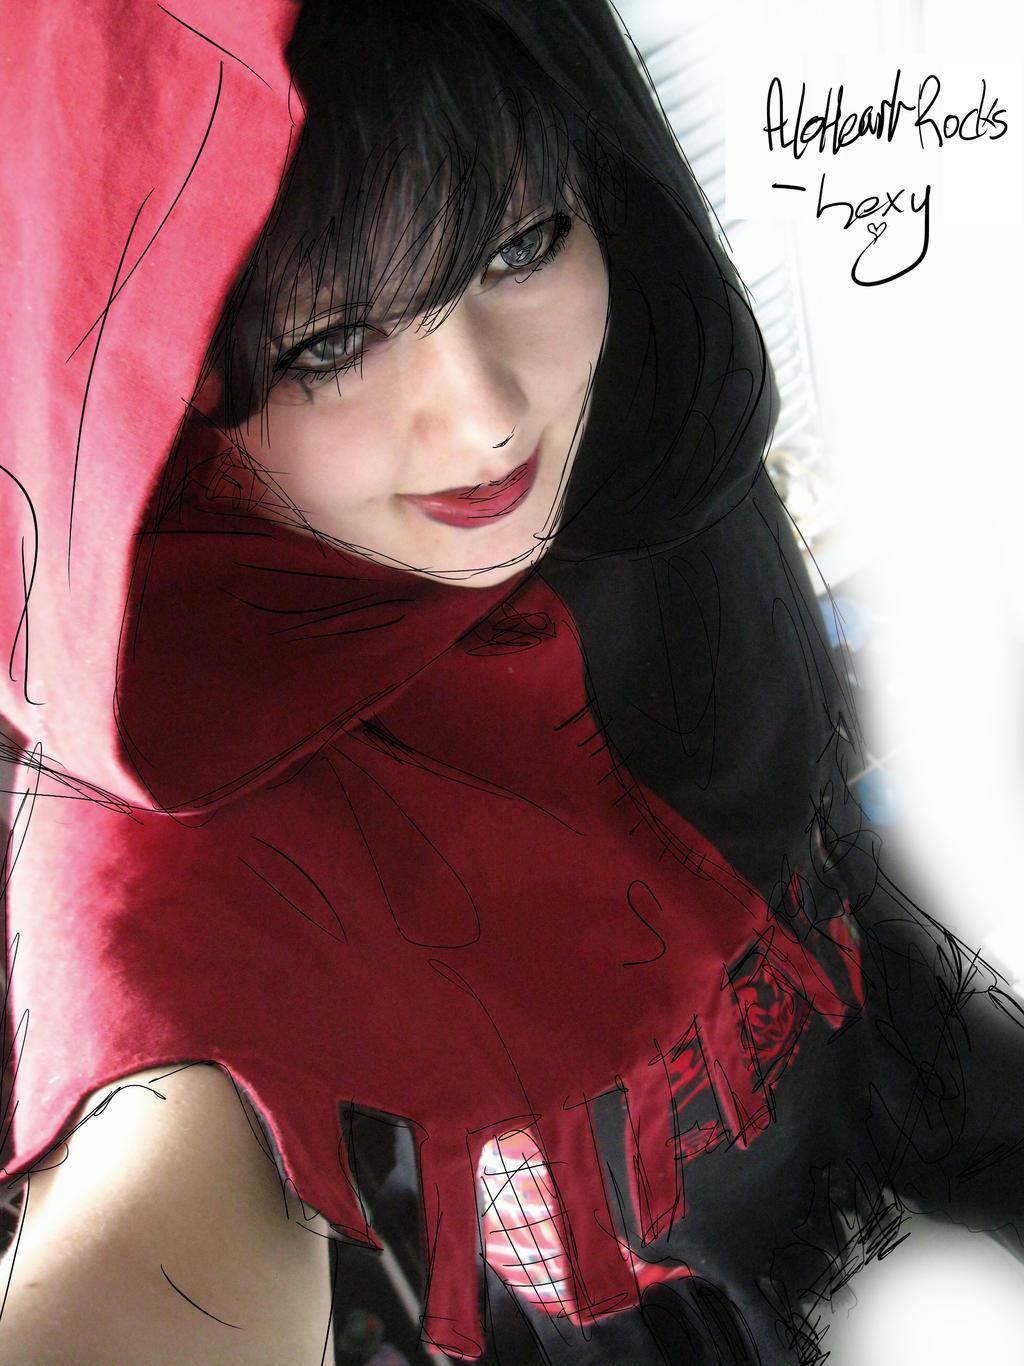 AloHeartRocks-Lexy's Profile Picture